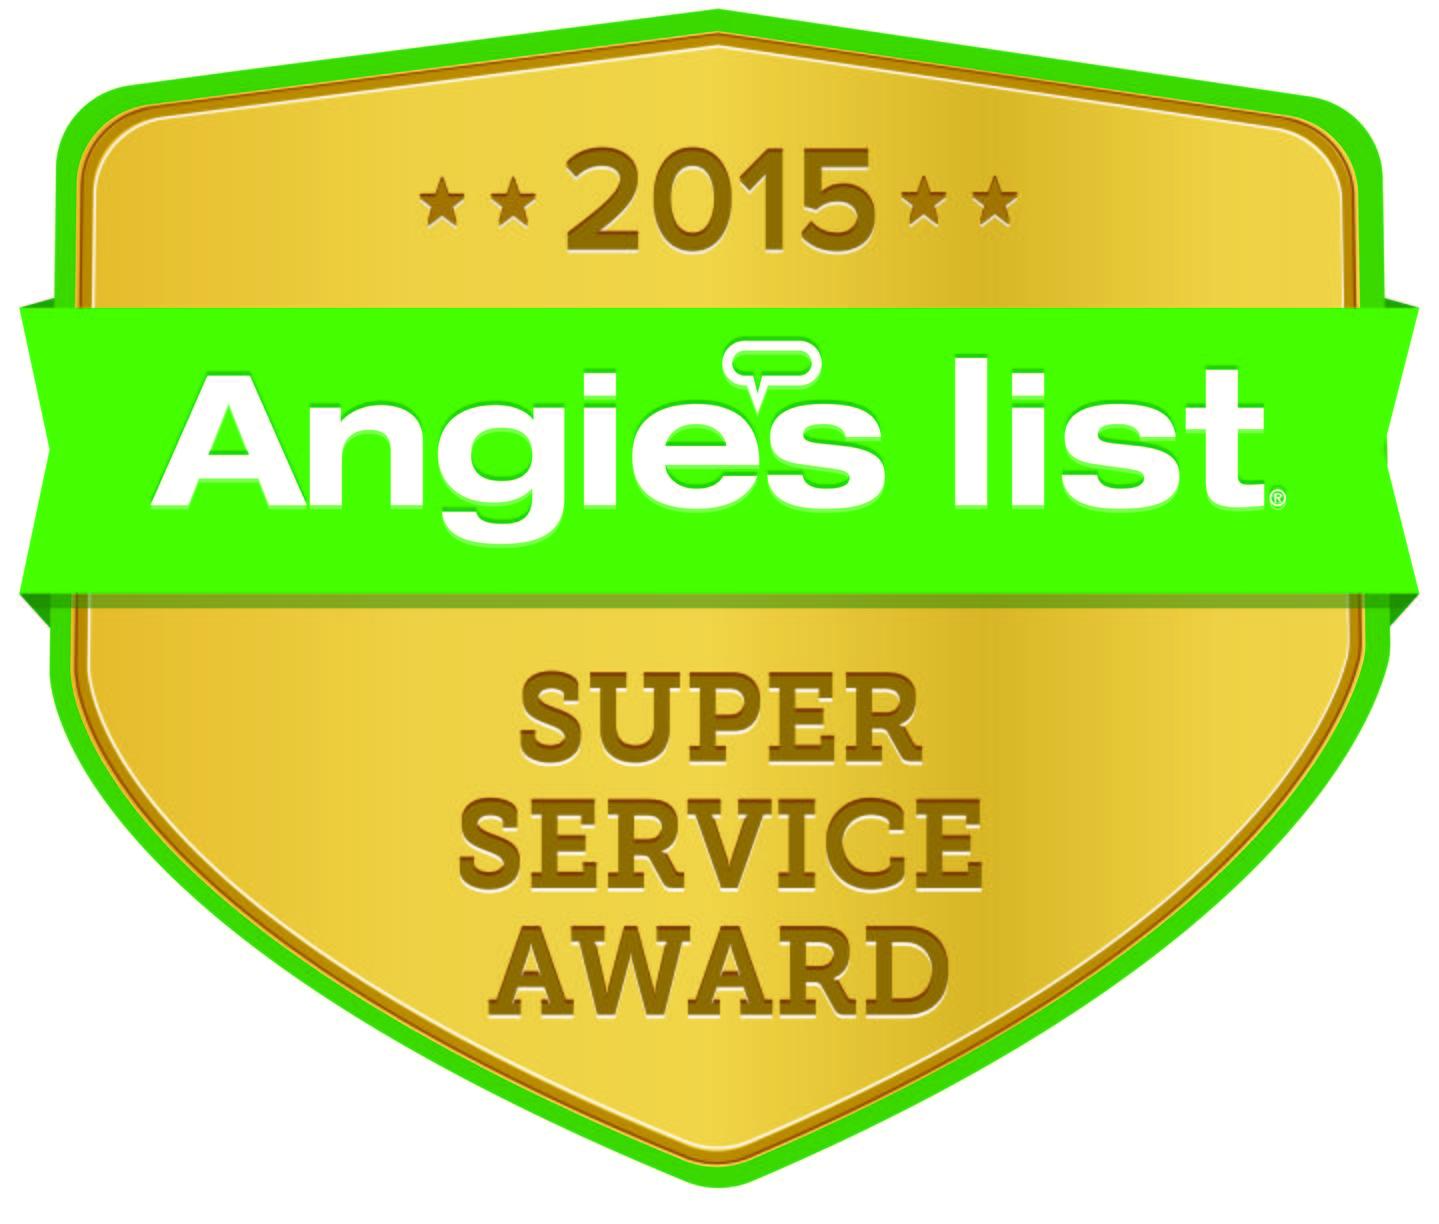 2015 Super Service Award Winners